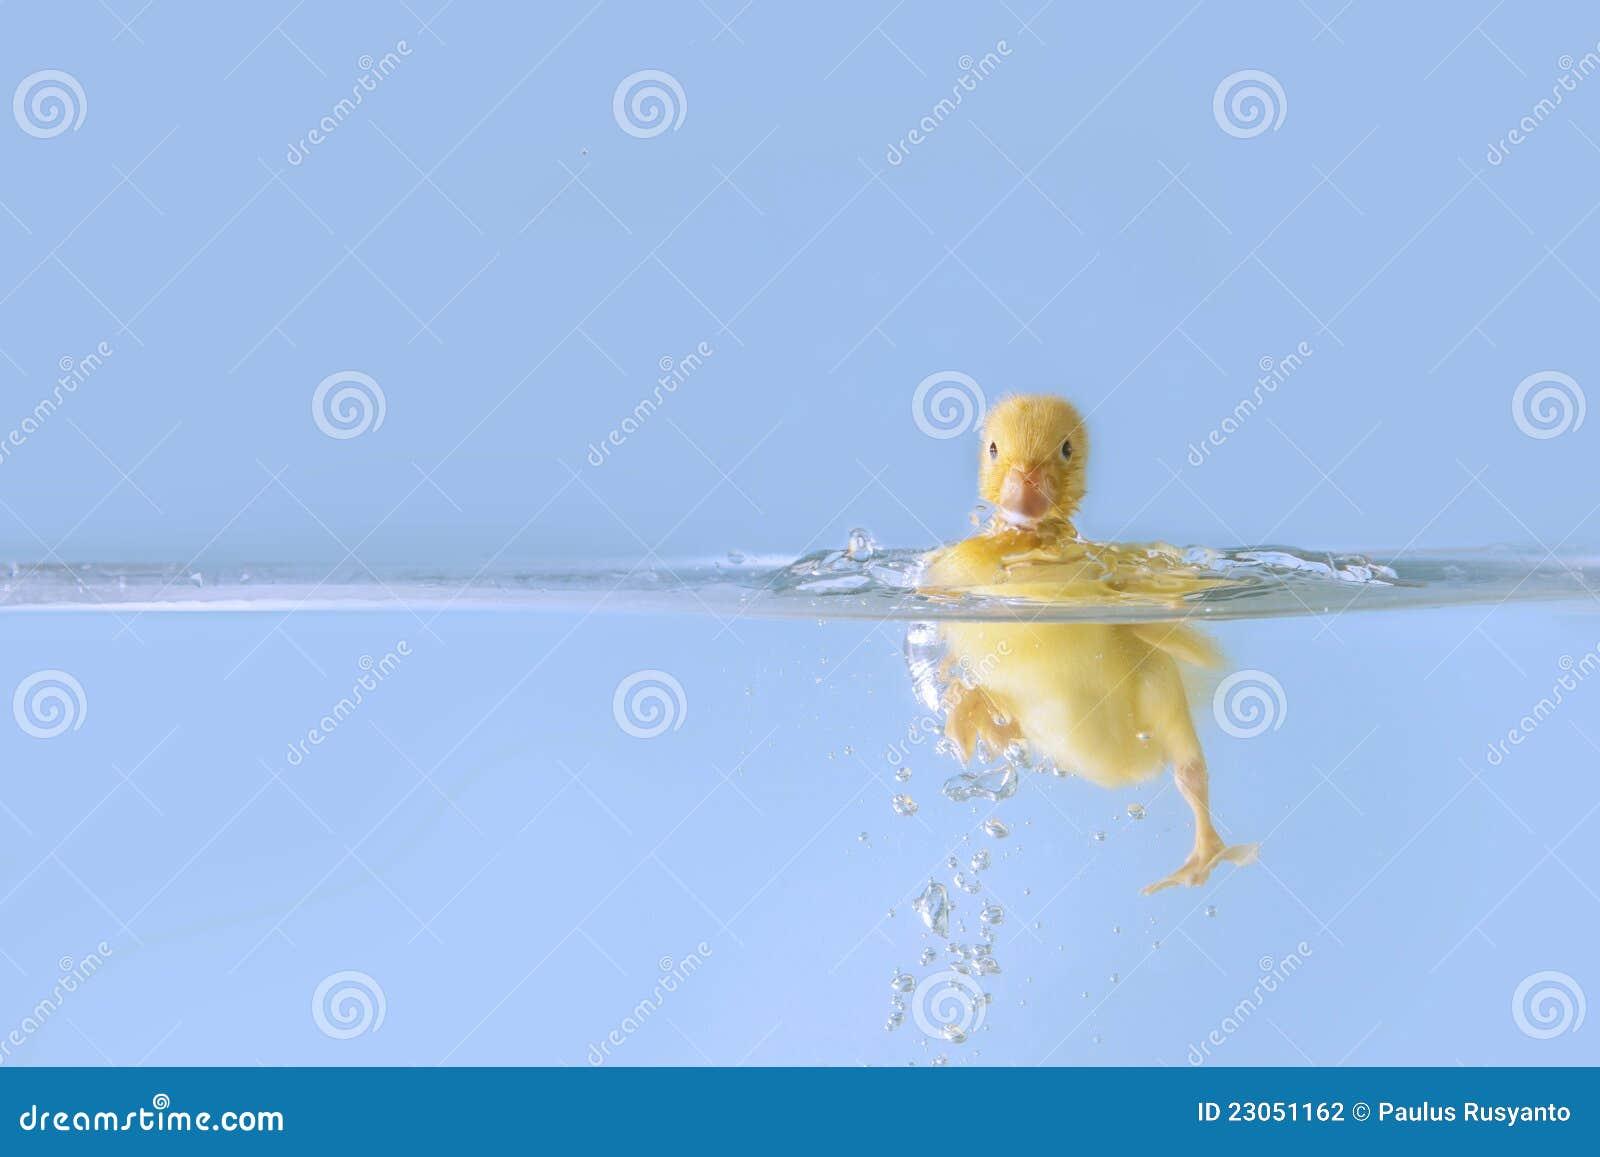 Duck splashing into water